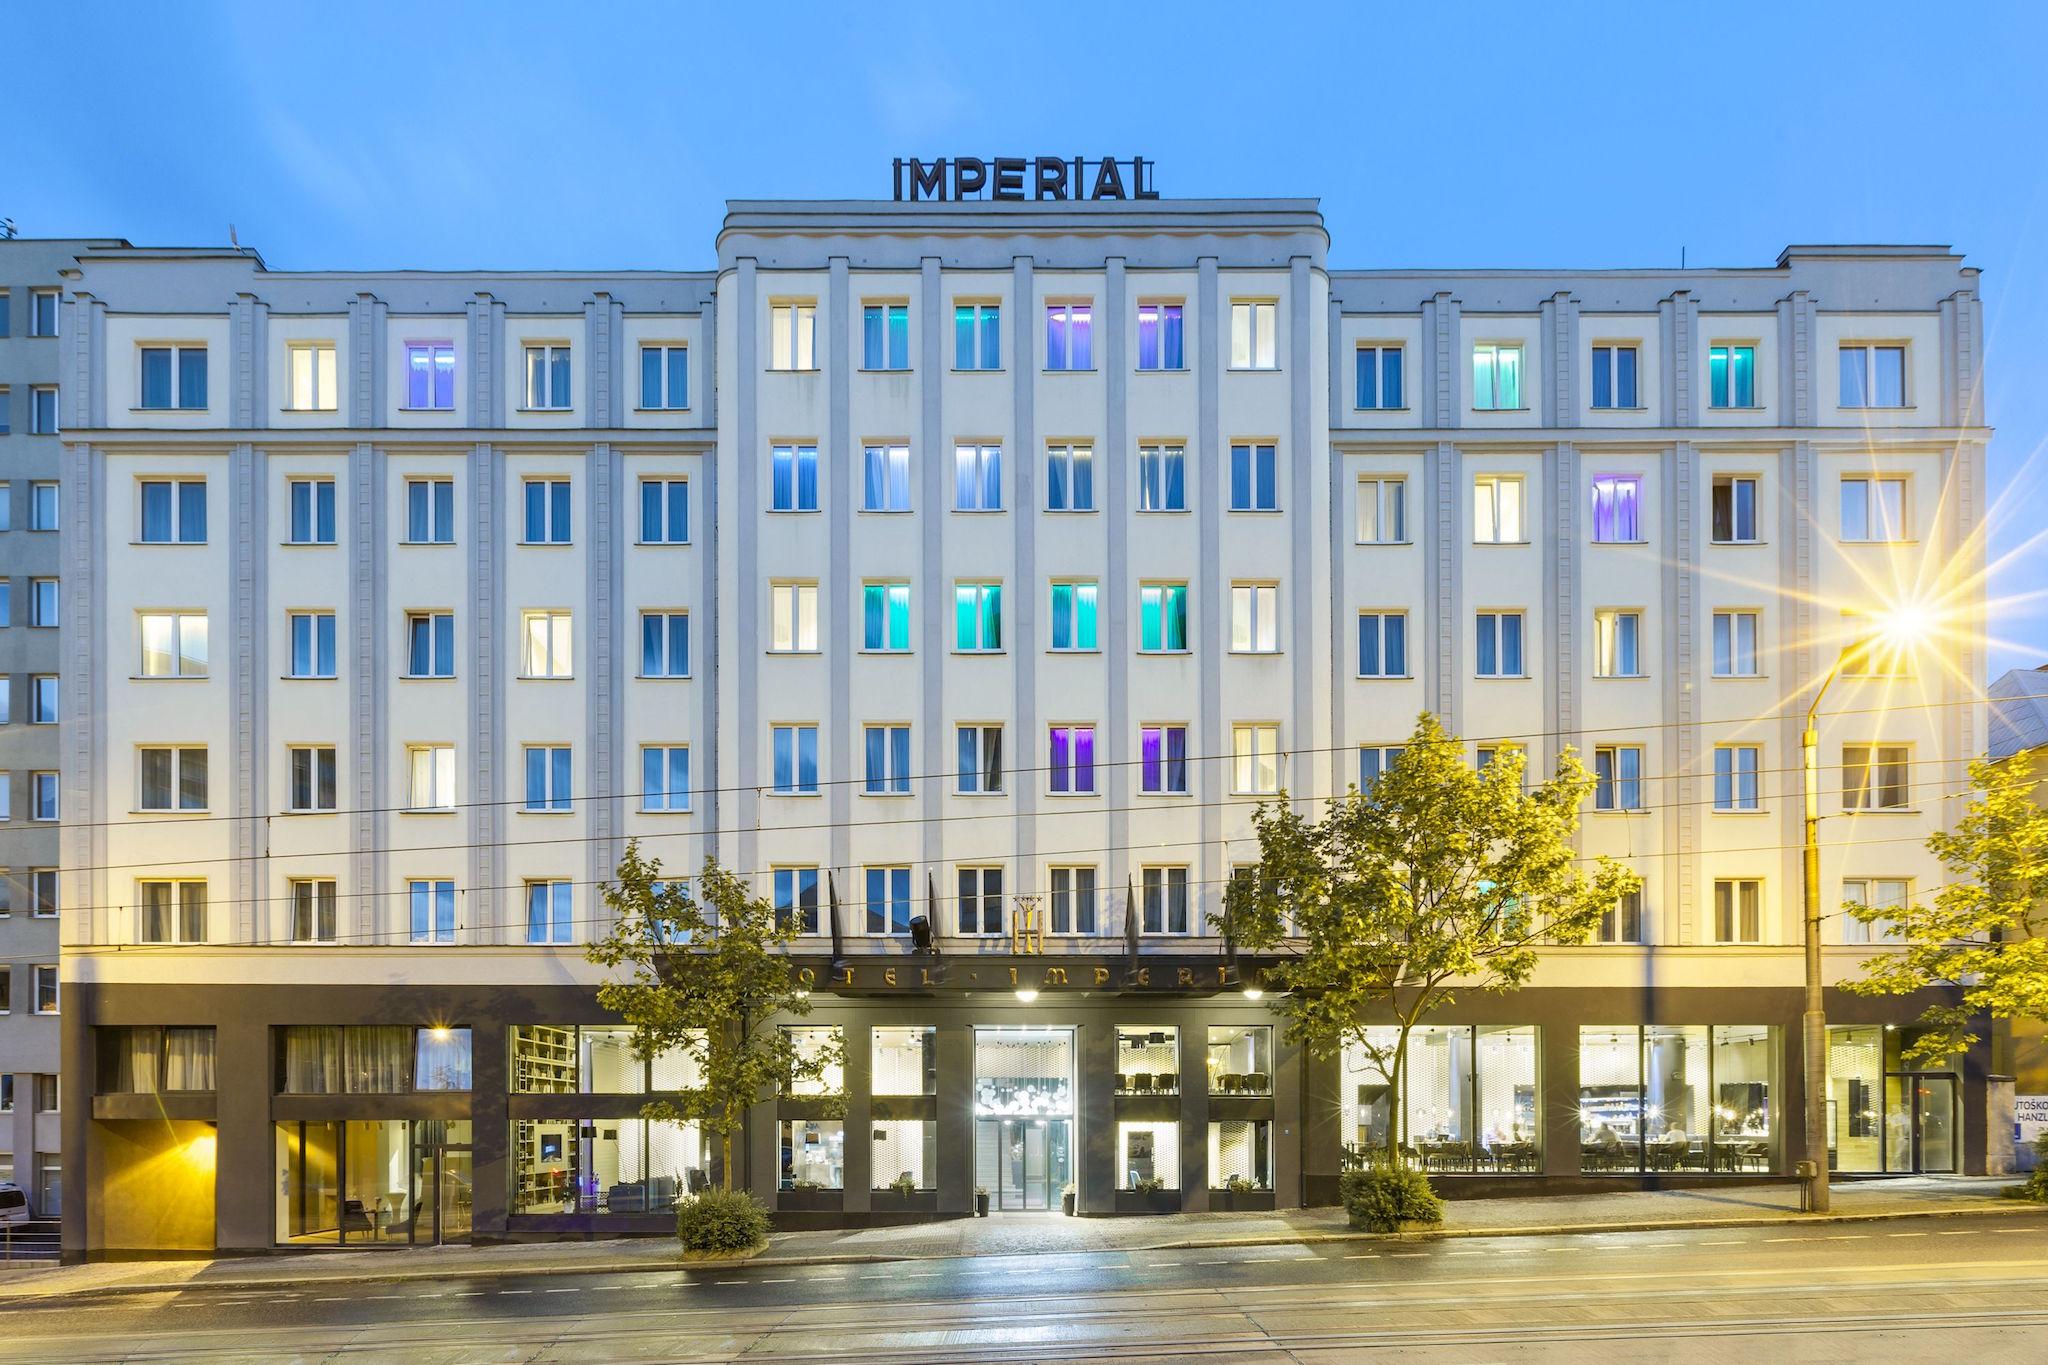 Grand HotelPytloun Imperial Liberec